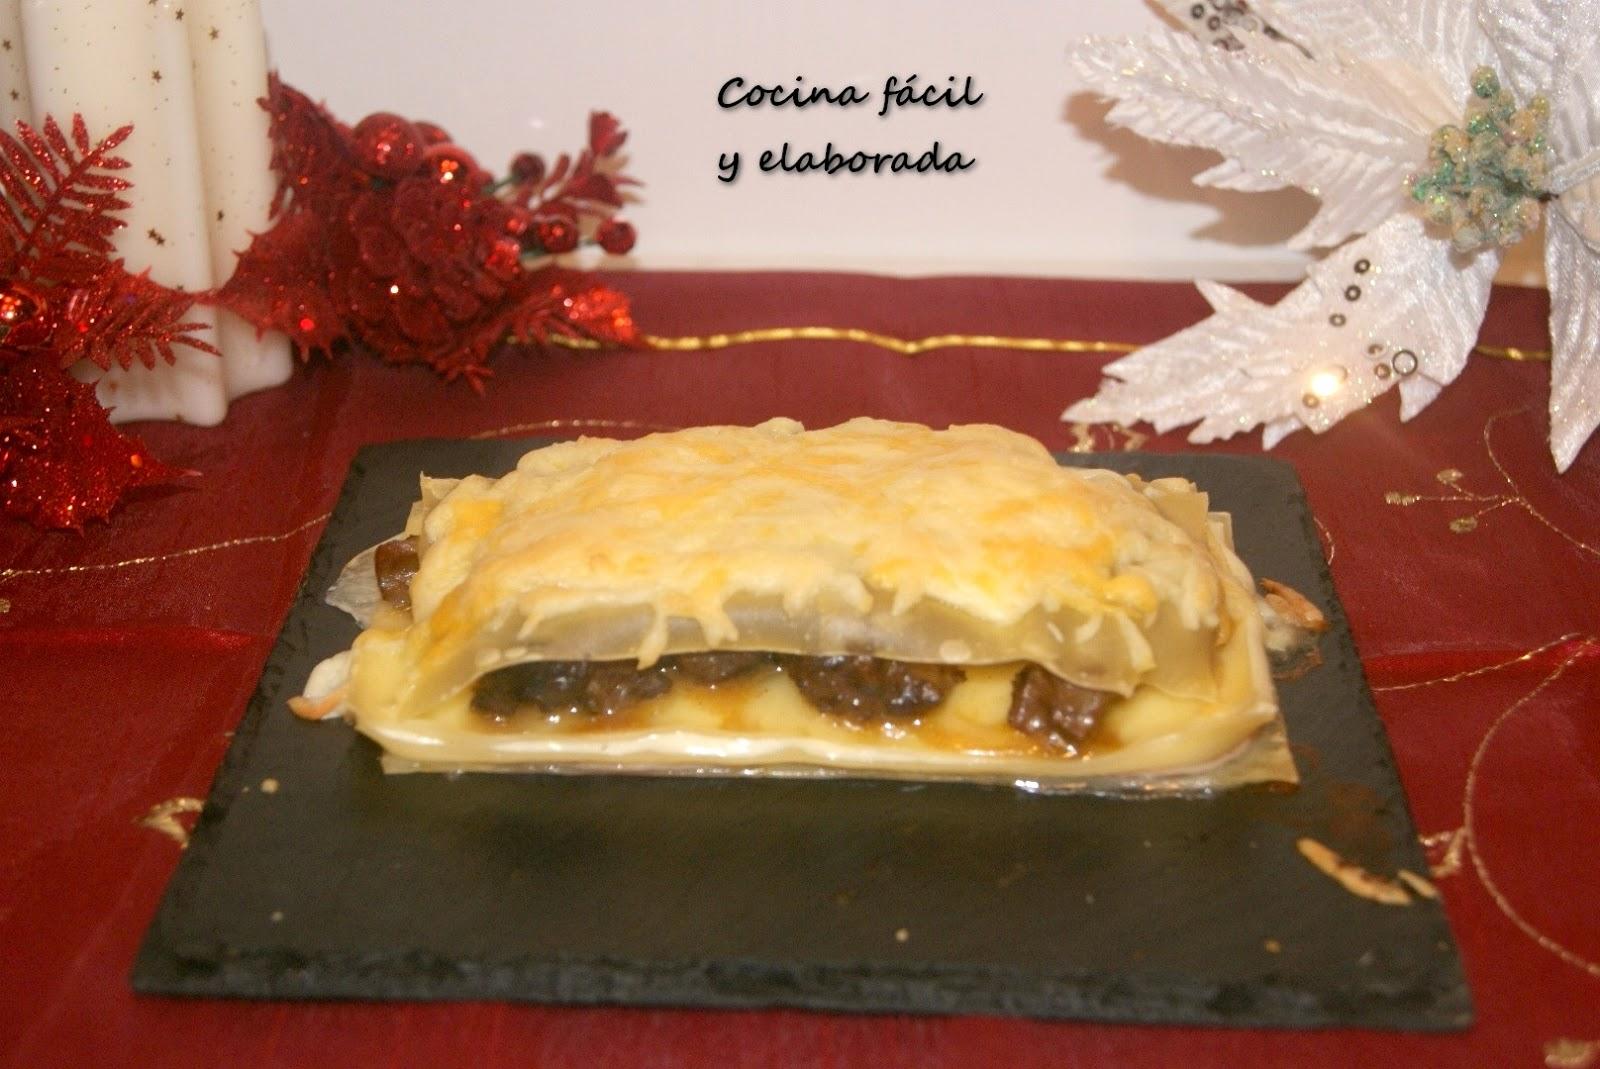 Cocina facil y elaborada lasa a de carrilleras en salsa for Cocina facil para navidad